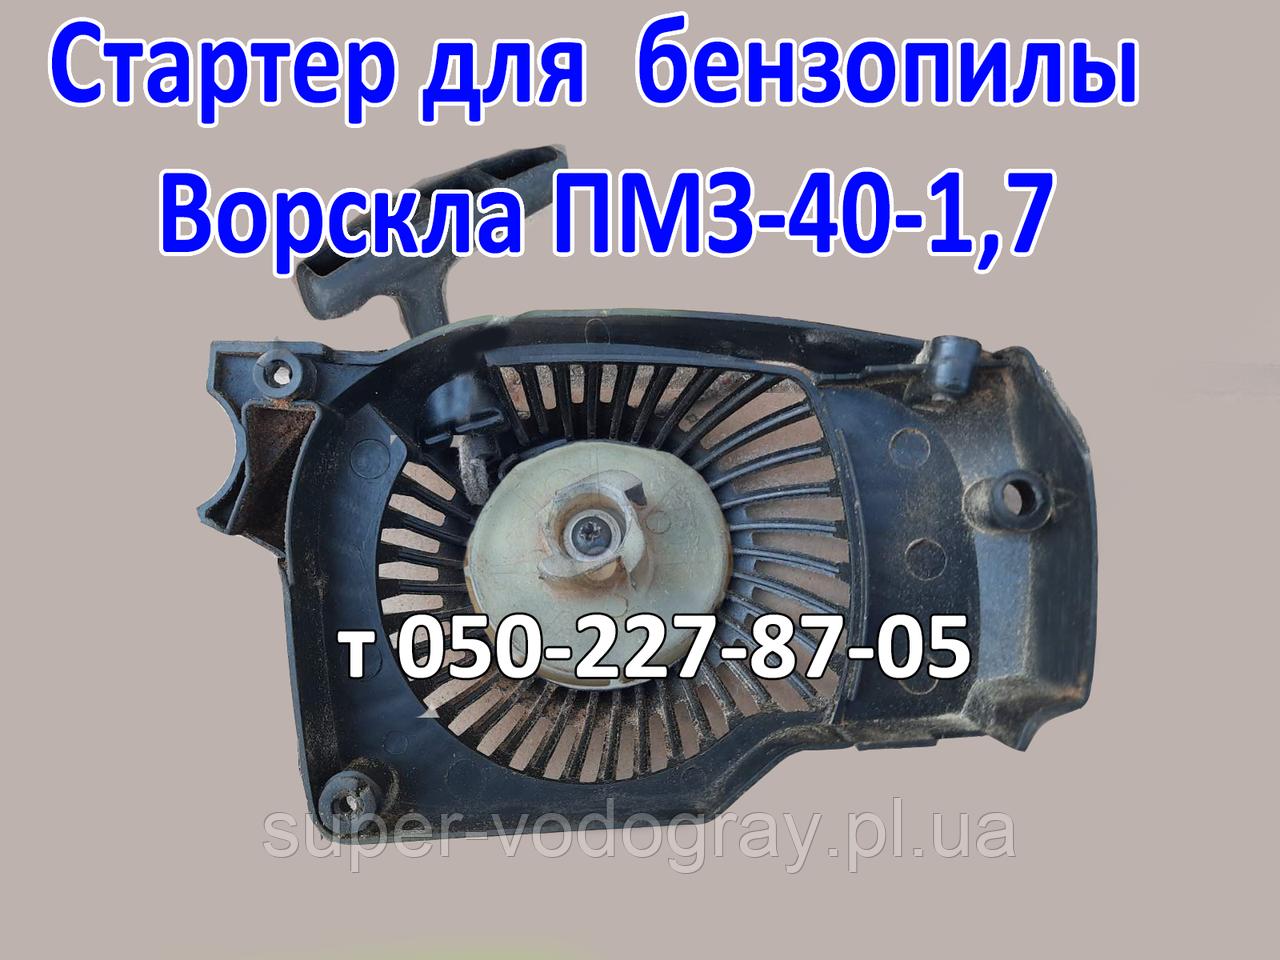 Стартер для бензопили Ворскла ПМЗ-40-1,7